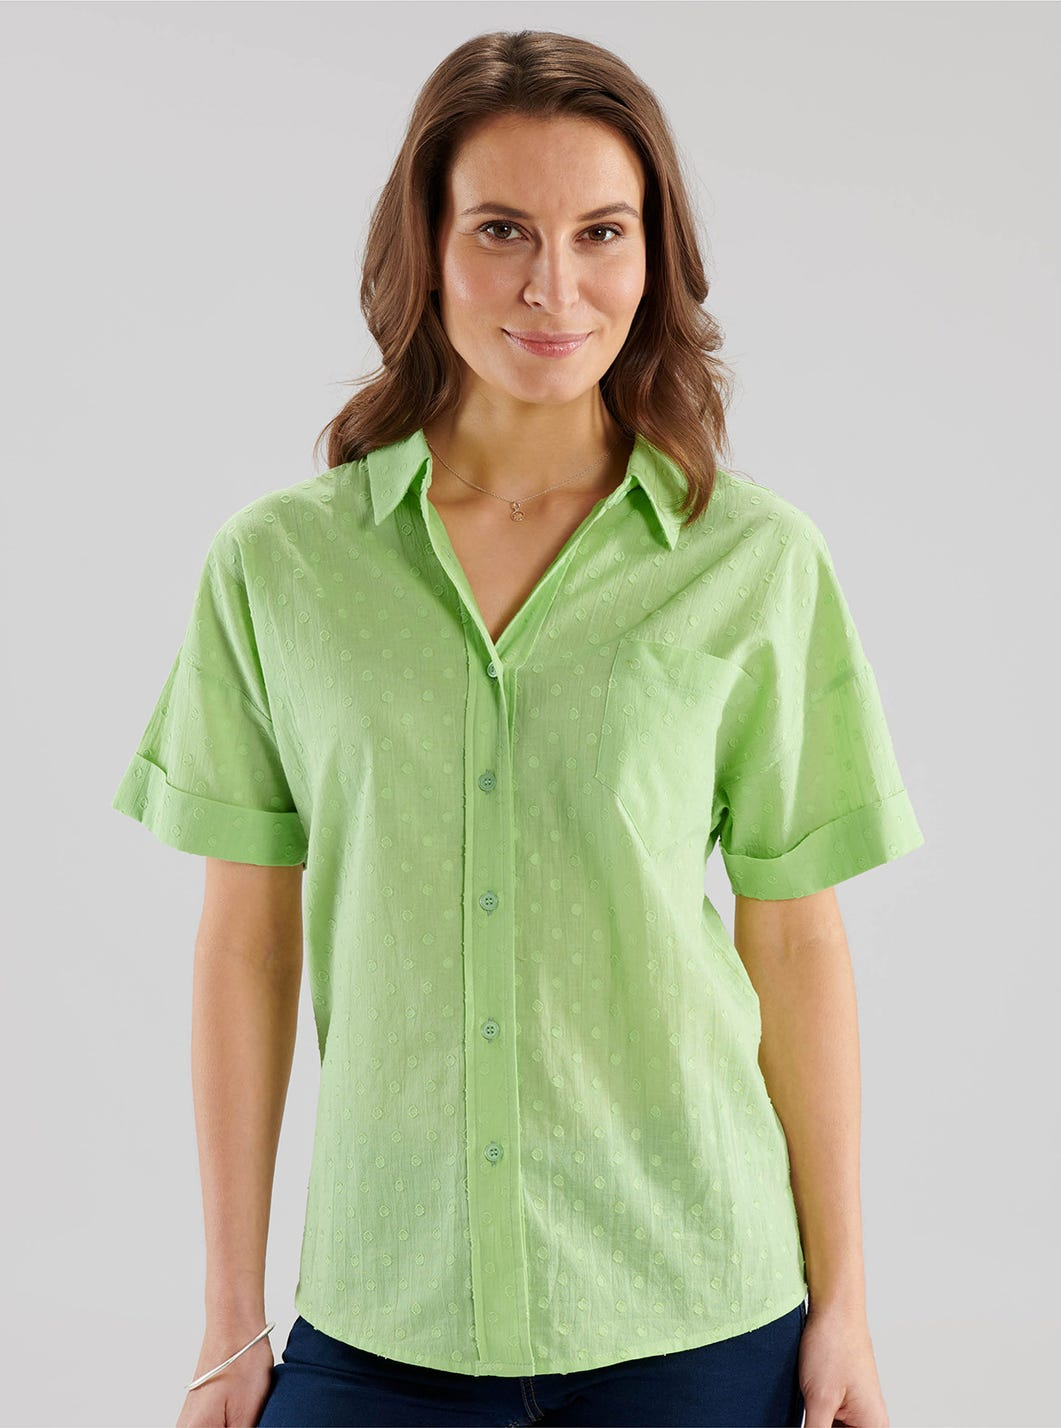 Bright cotton shirt